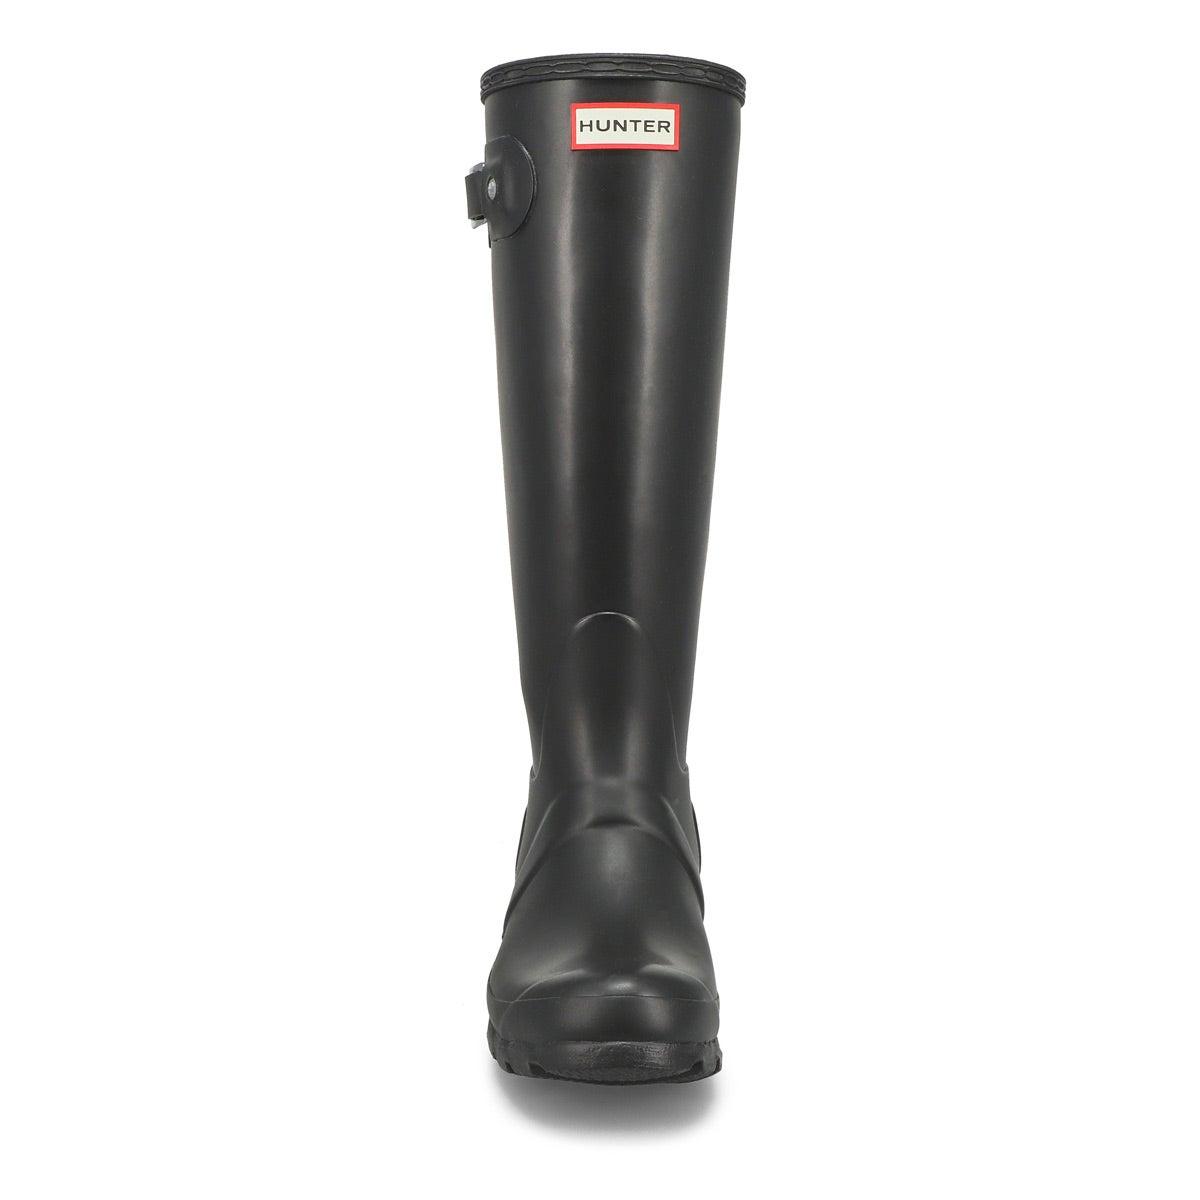 Lds Original Tall Classic blk rain boot